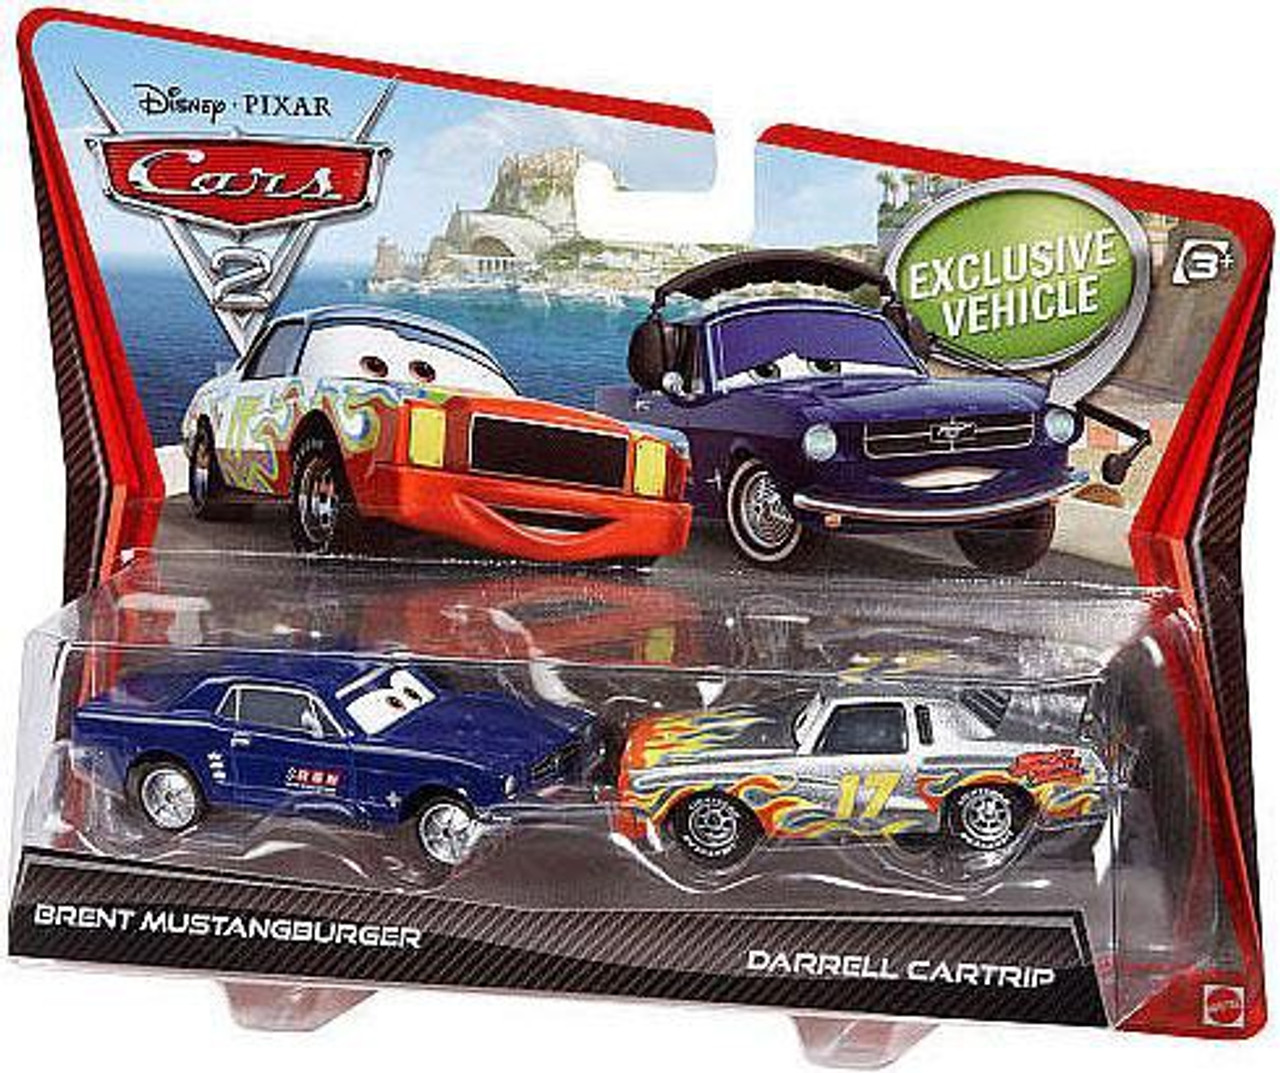 Disney Cars Cars 2 Brent Mustangburger & Darrel Cartrip Diecast Car 2-Pack